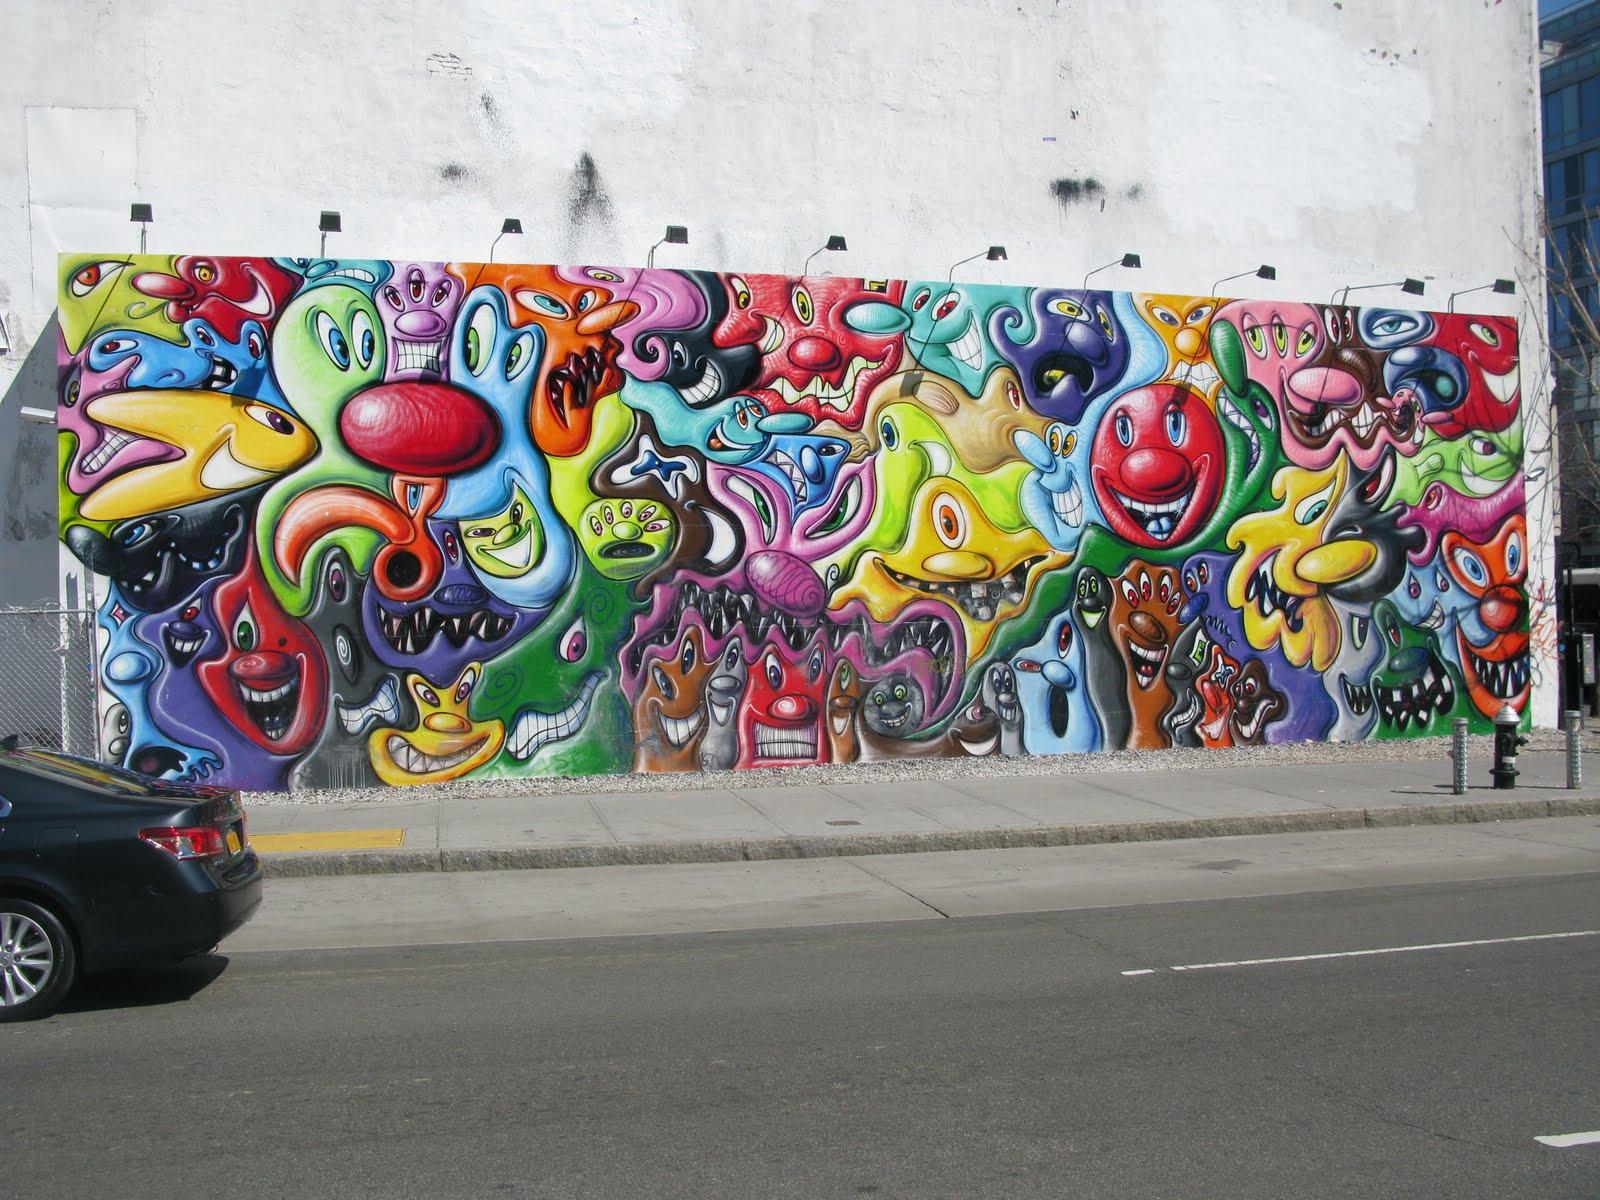 Awesome Fall Wallpapers Graffiti City Wallpapers Hd Download Free Pixelstalk Net